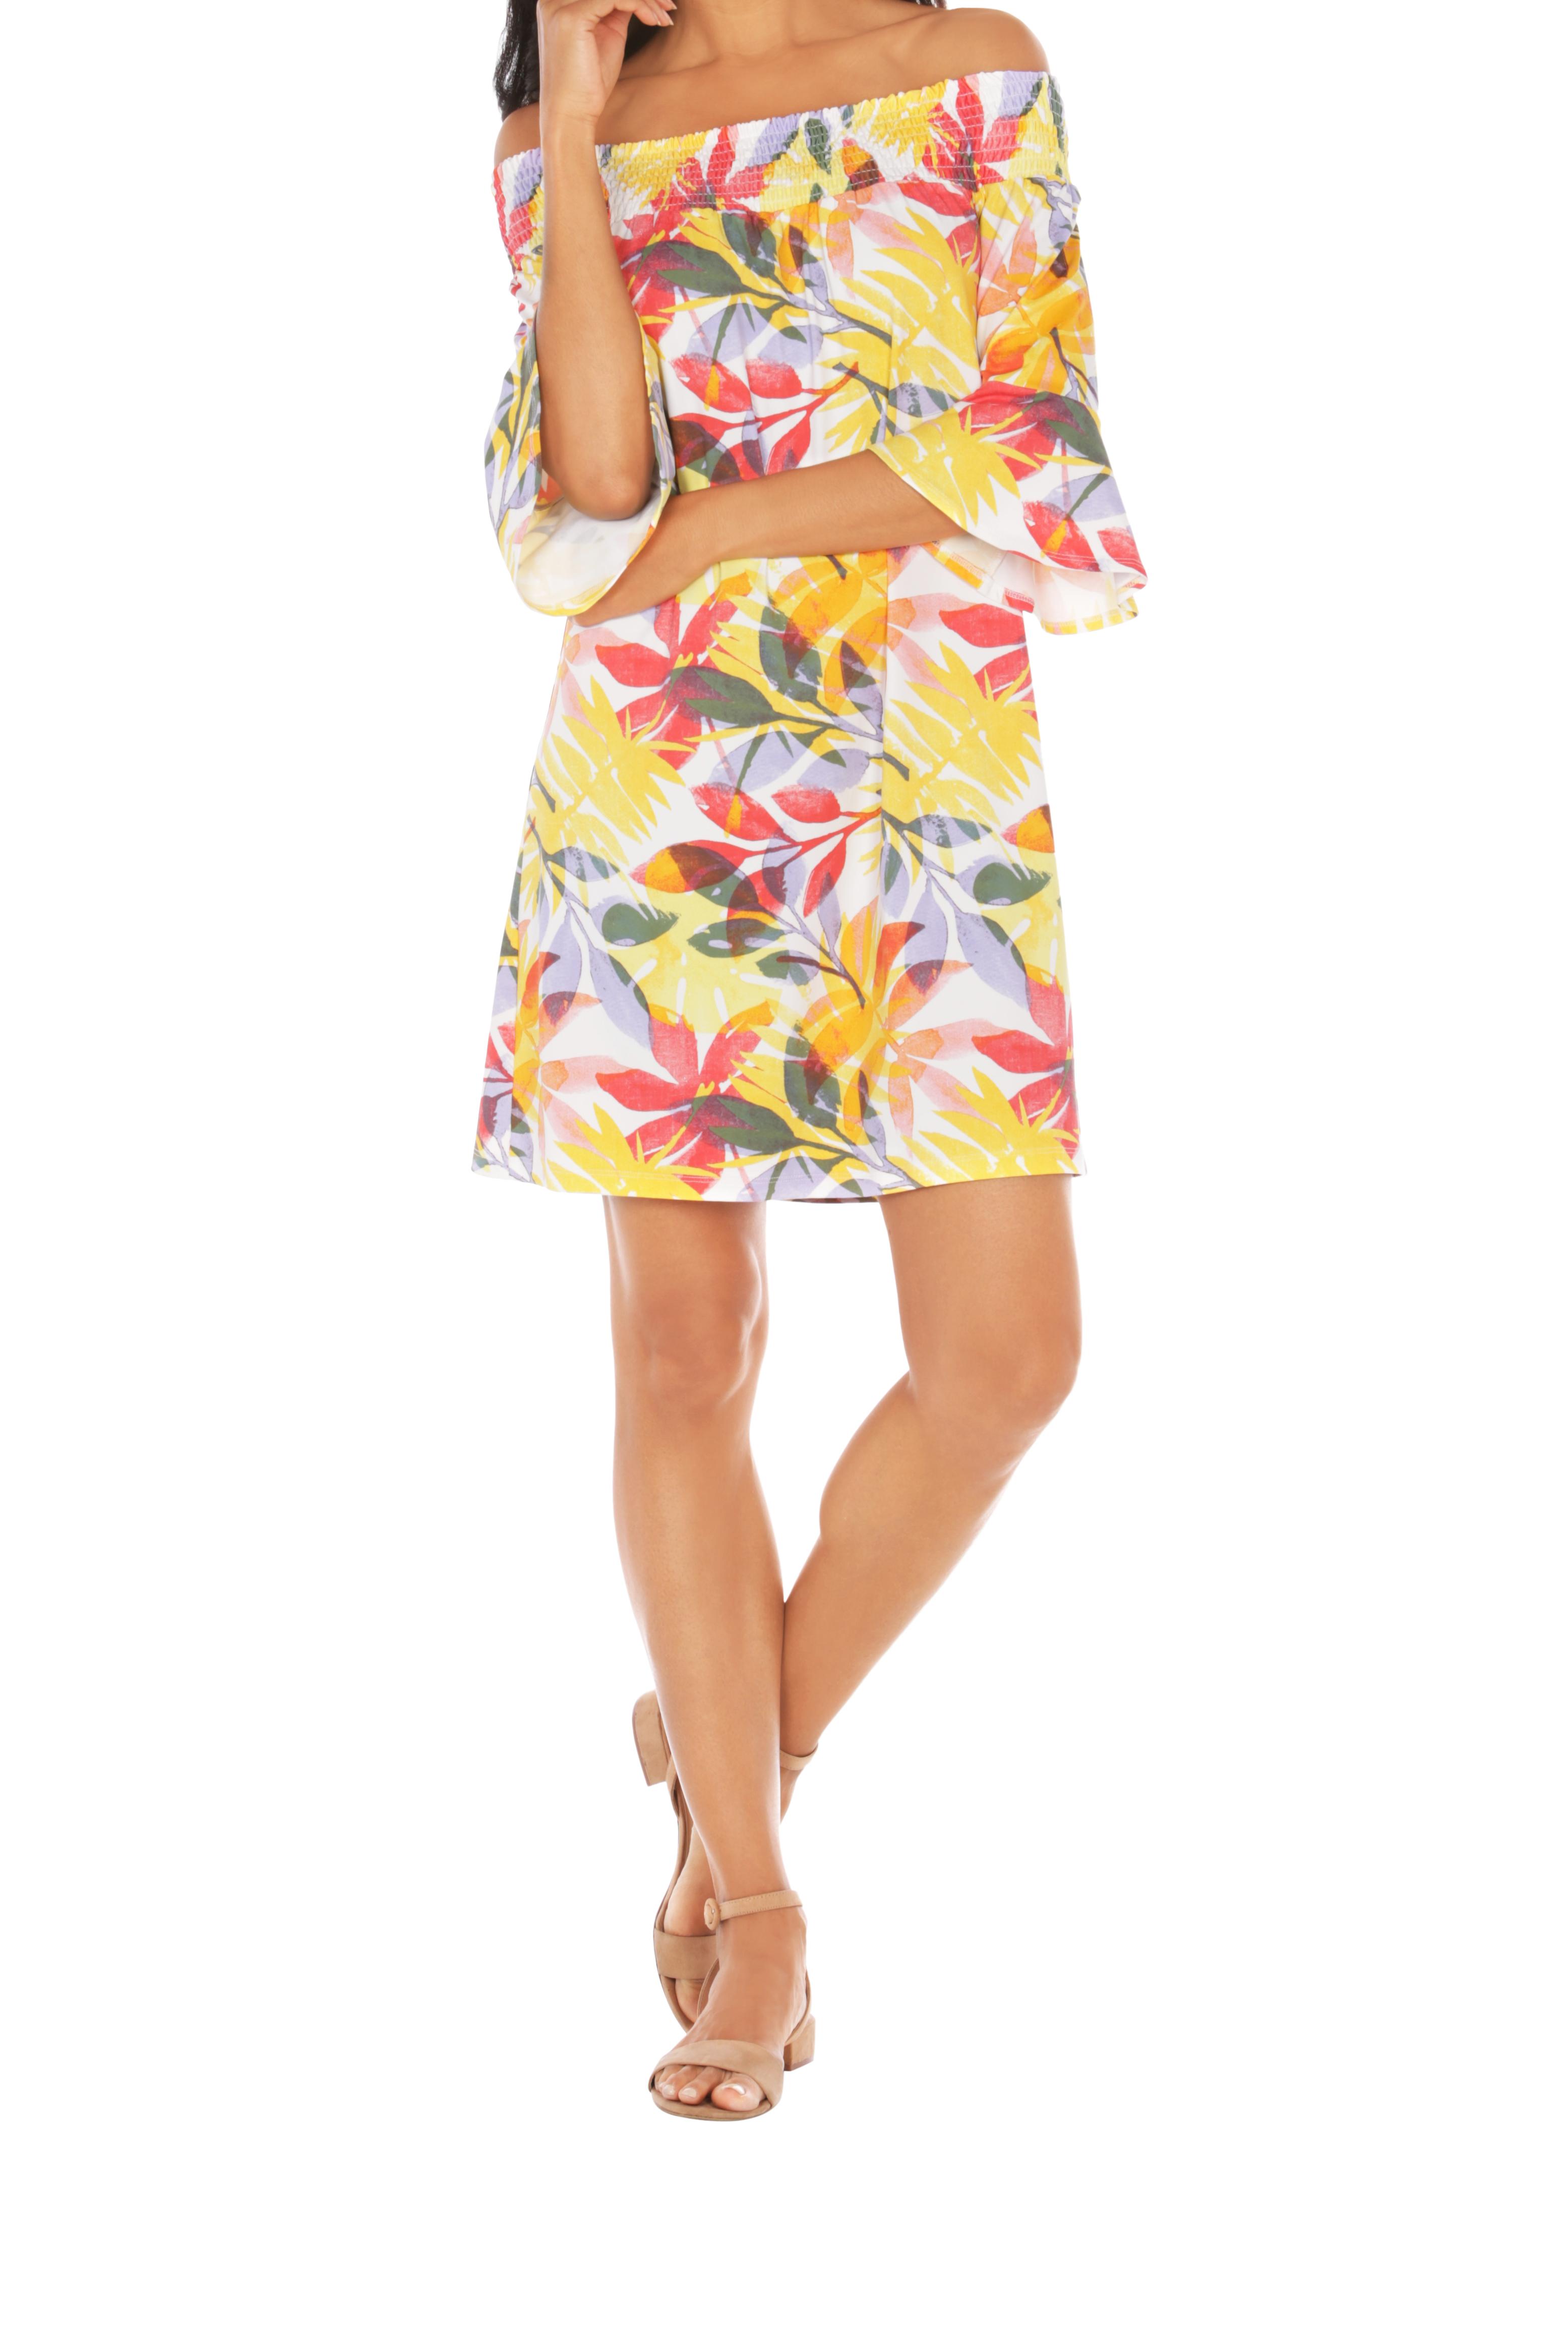 Caribbean Joe® UPF Sun Protection Off the Shoulder Dress -Sunrise - Front